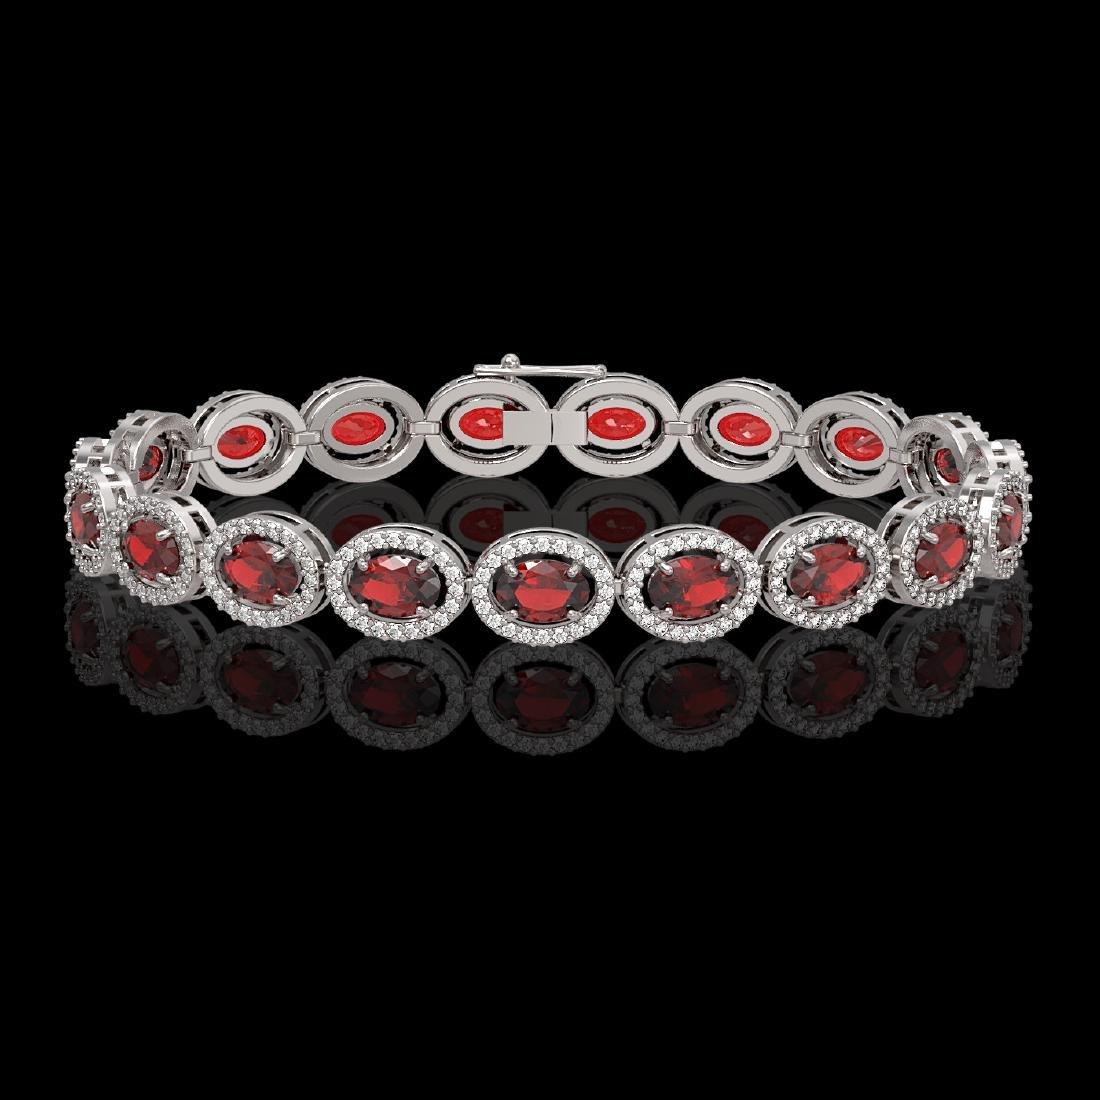 14.63 CTW Garnet & Diamond Halo Bracelet 10K White Gold